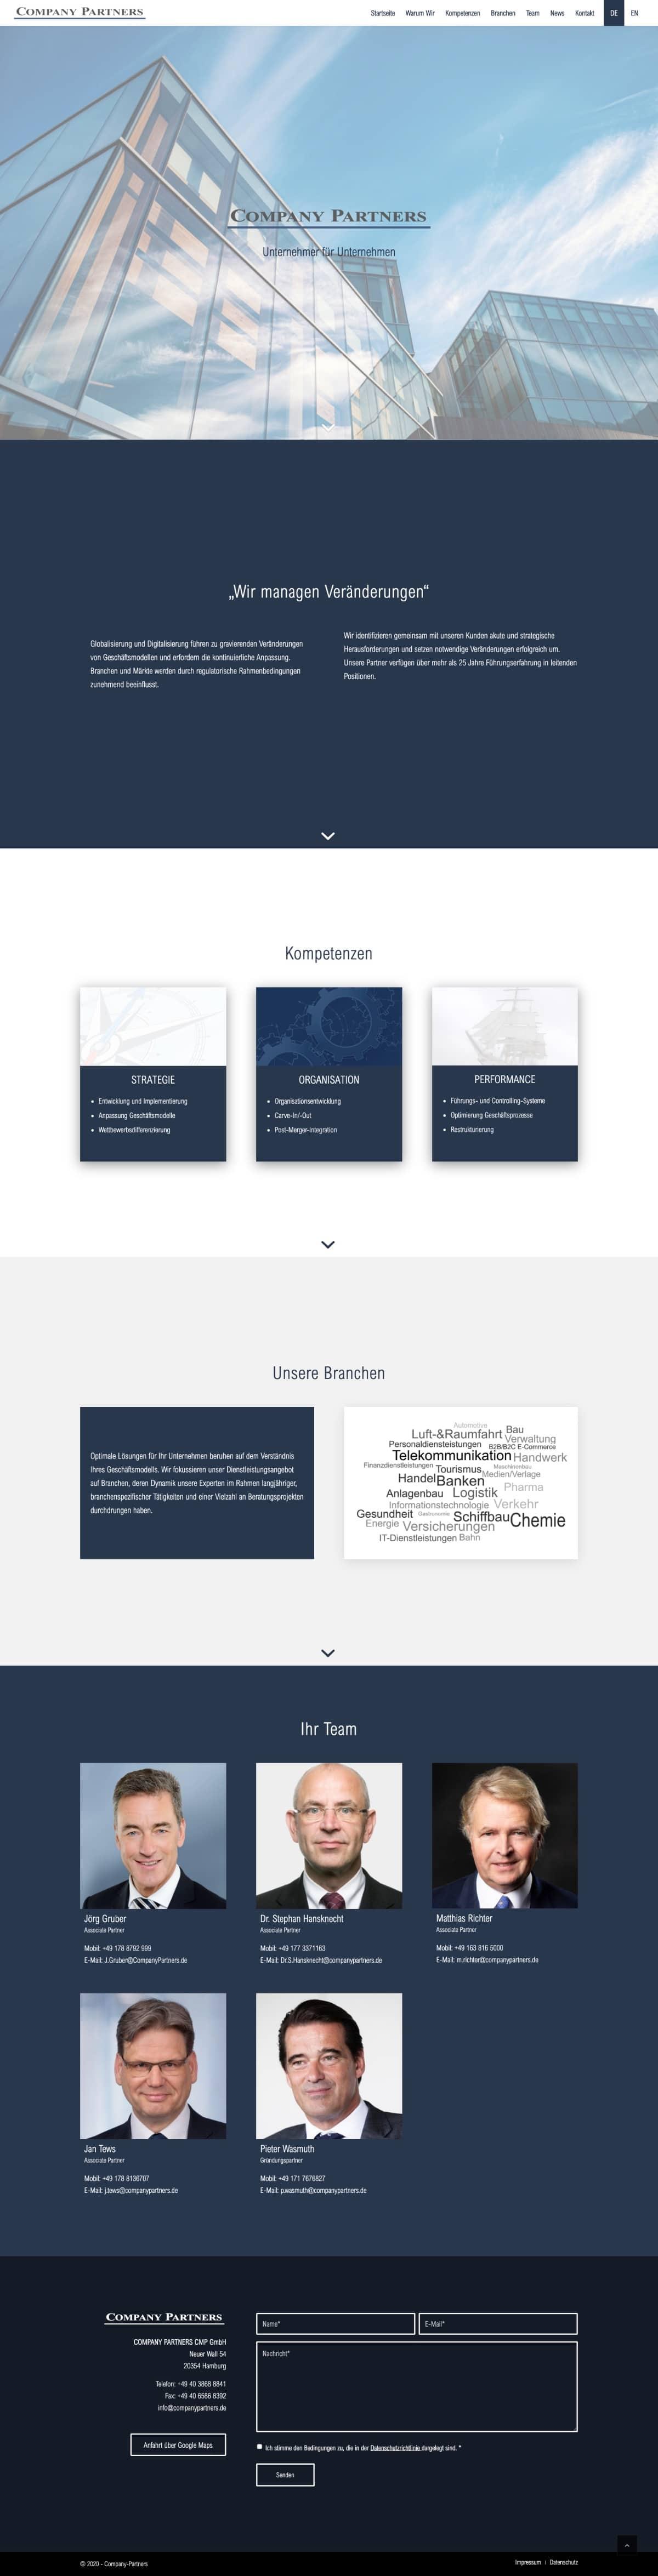 Company-Partners- Website